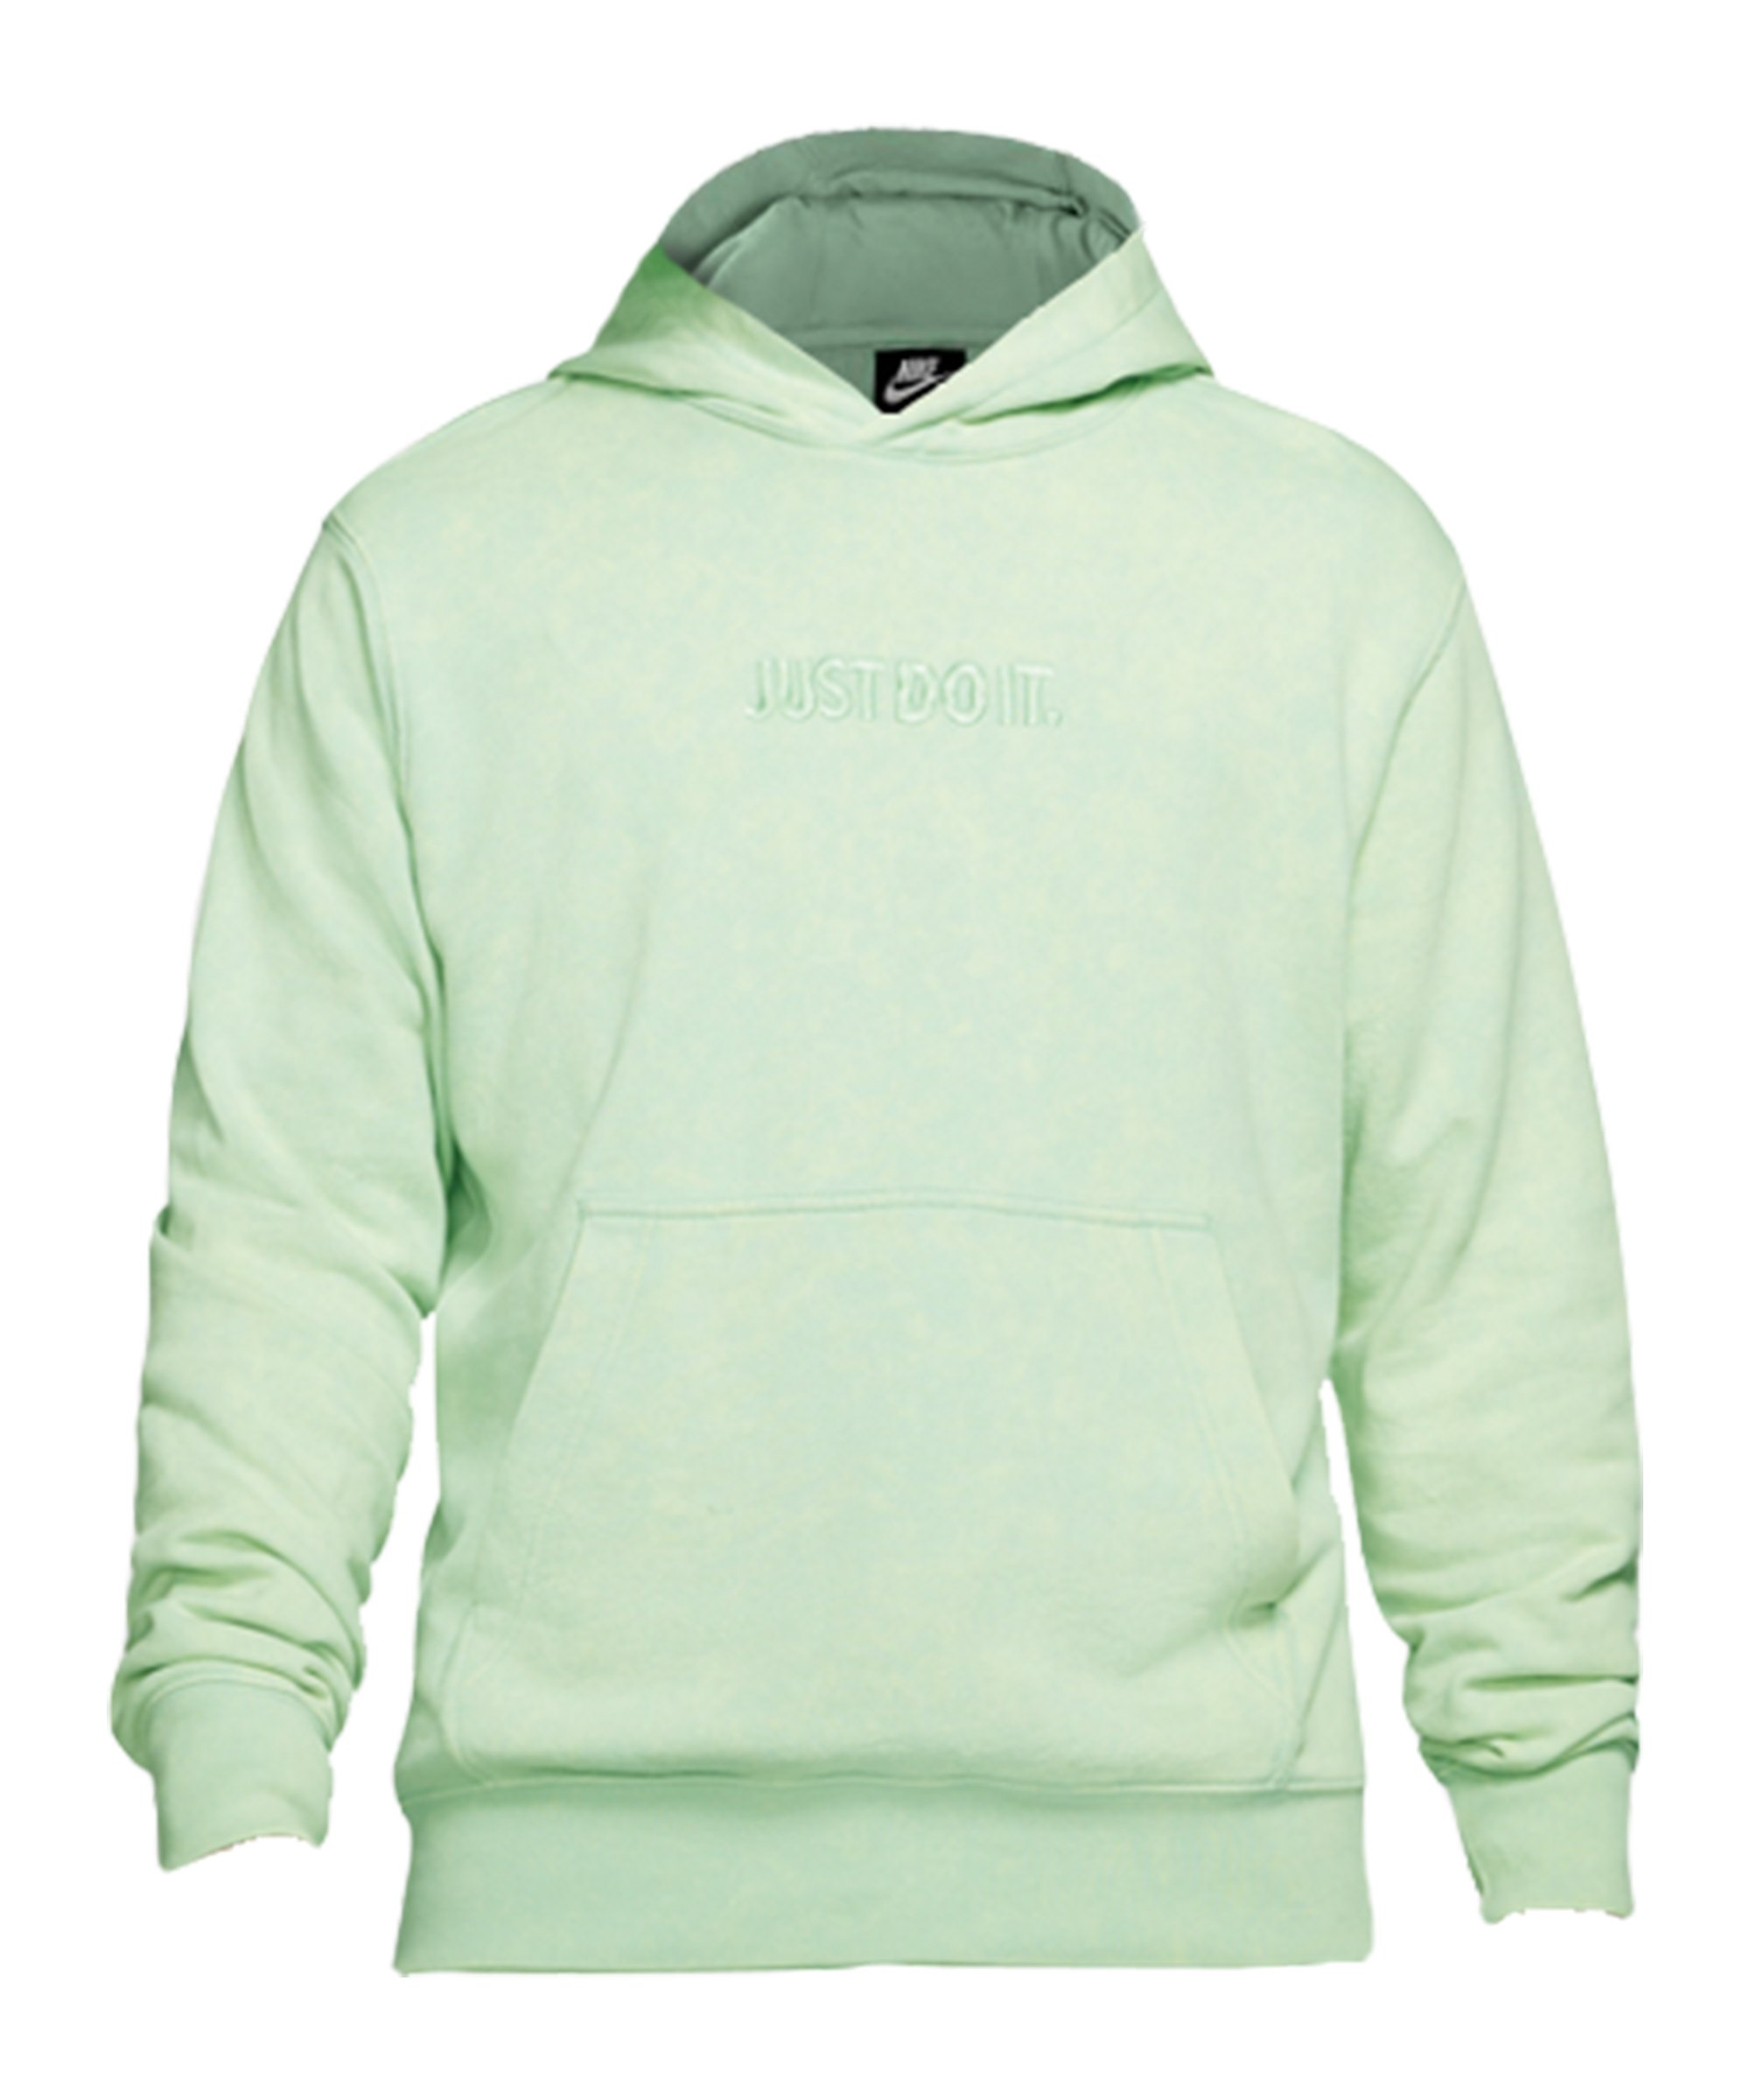 Nike JDI Wash Kapuzensweatshirt Grün F321 - gruen